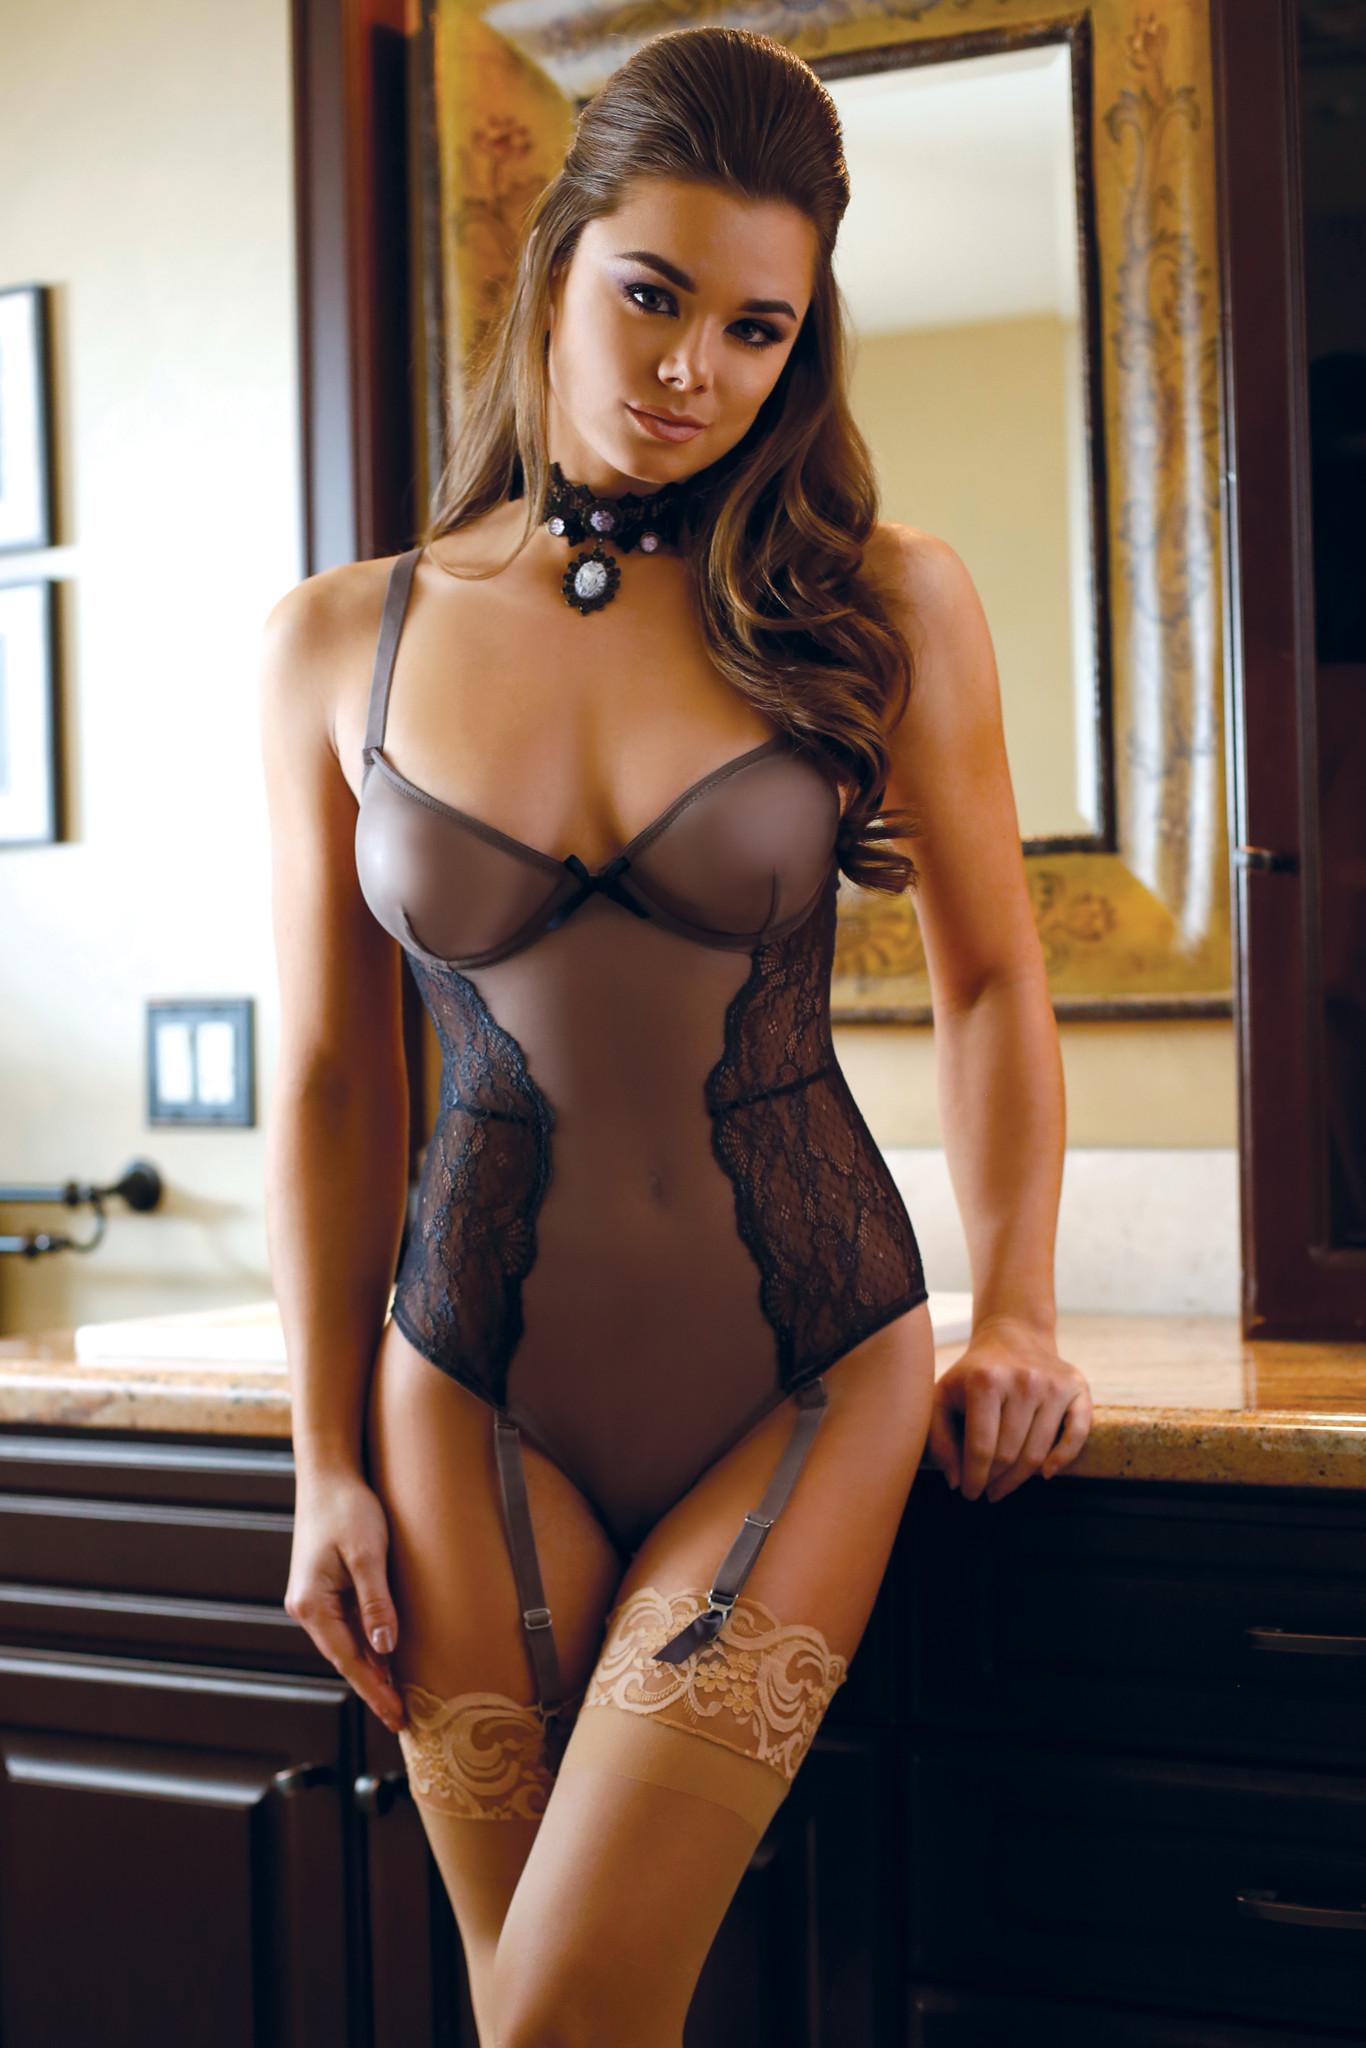 hot girl in see through lingerie